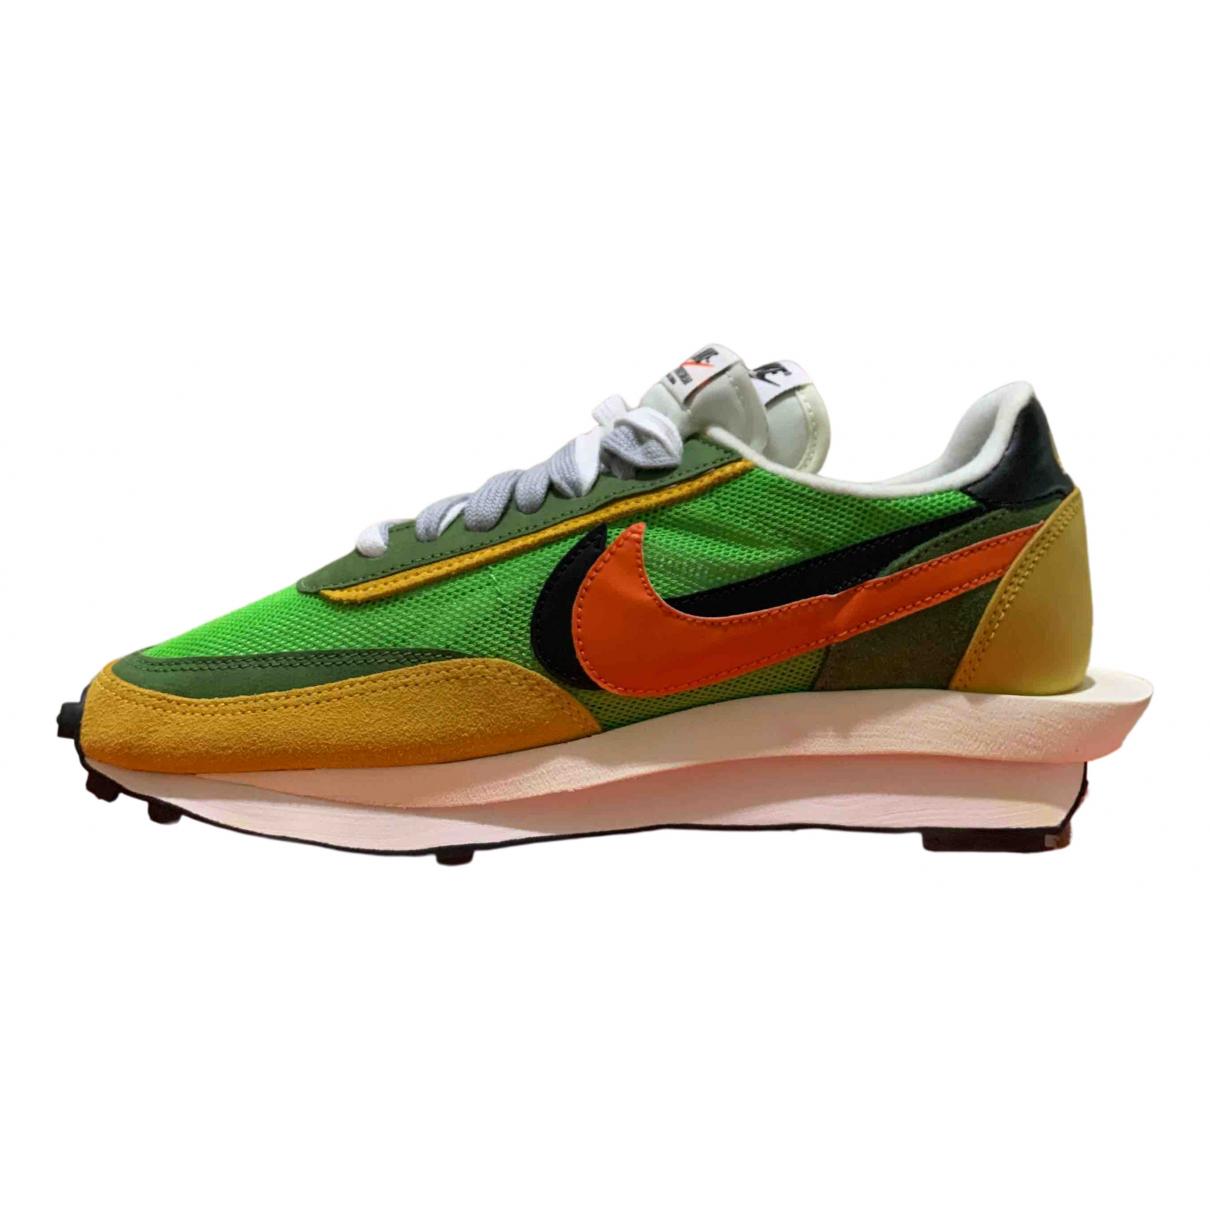 Nike X Sacai - Baskets LDV Waffle pour homme - vert